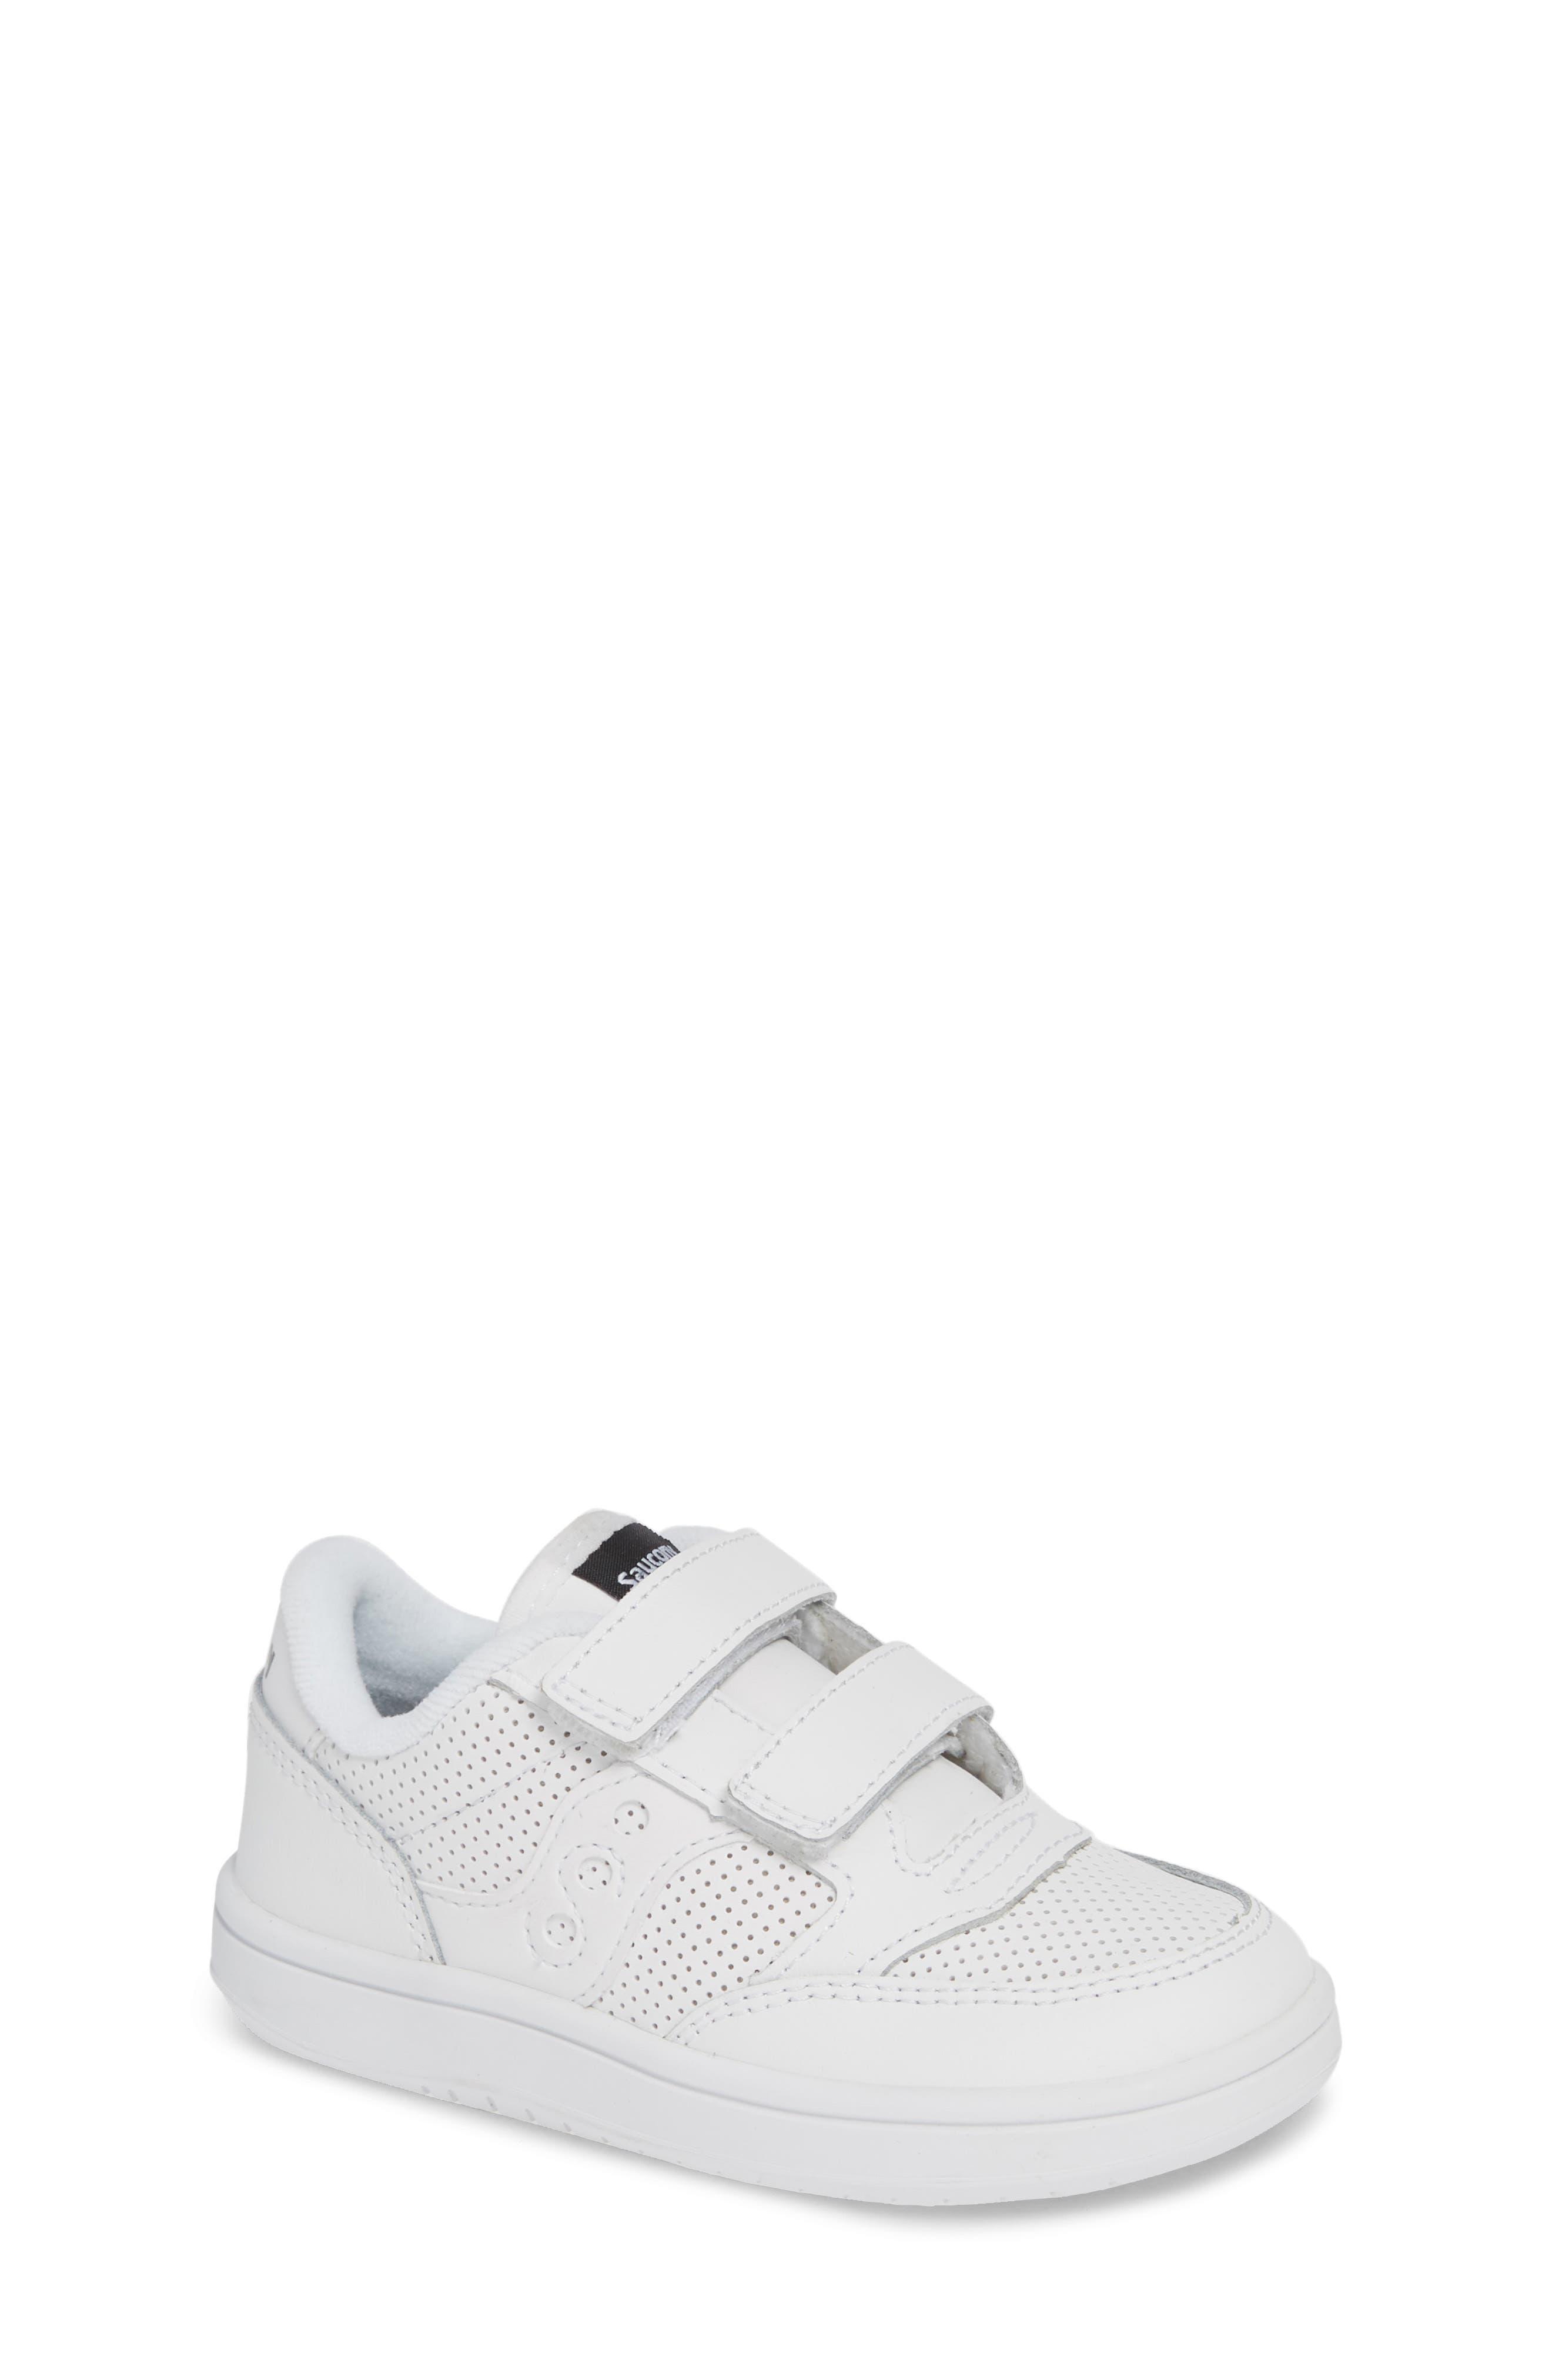 Jazz Court Sneaker,                             Main thumbnail 1, color,                             WHITE